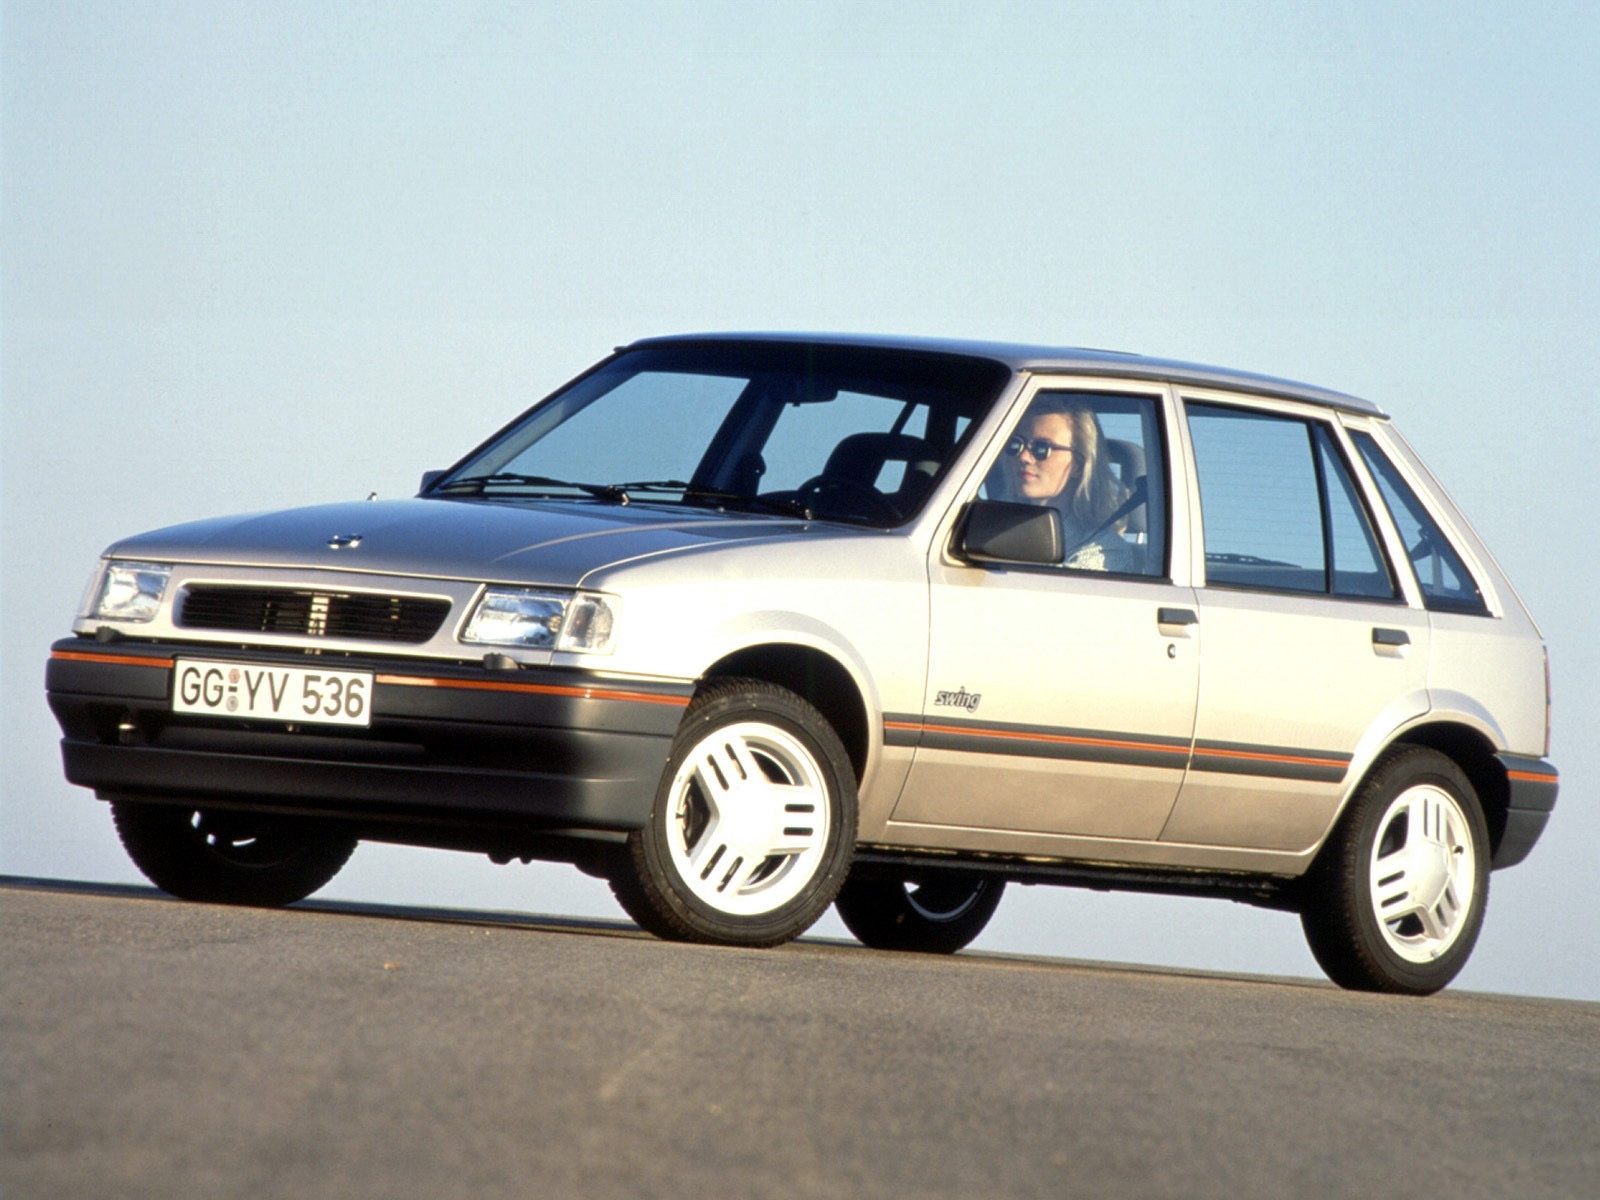 opel corsa a 5 door 1990 1993 opel corsa a 5 door 1990 1993 photo 02 car in pictures car. Black Bedroom Furniture Sets. Home Design Ideas